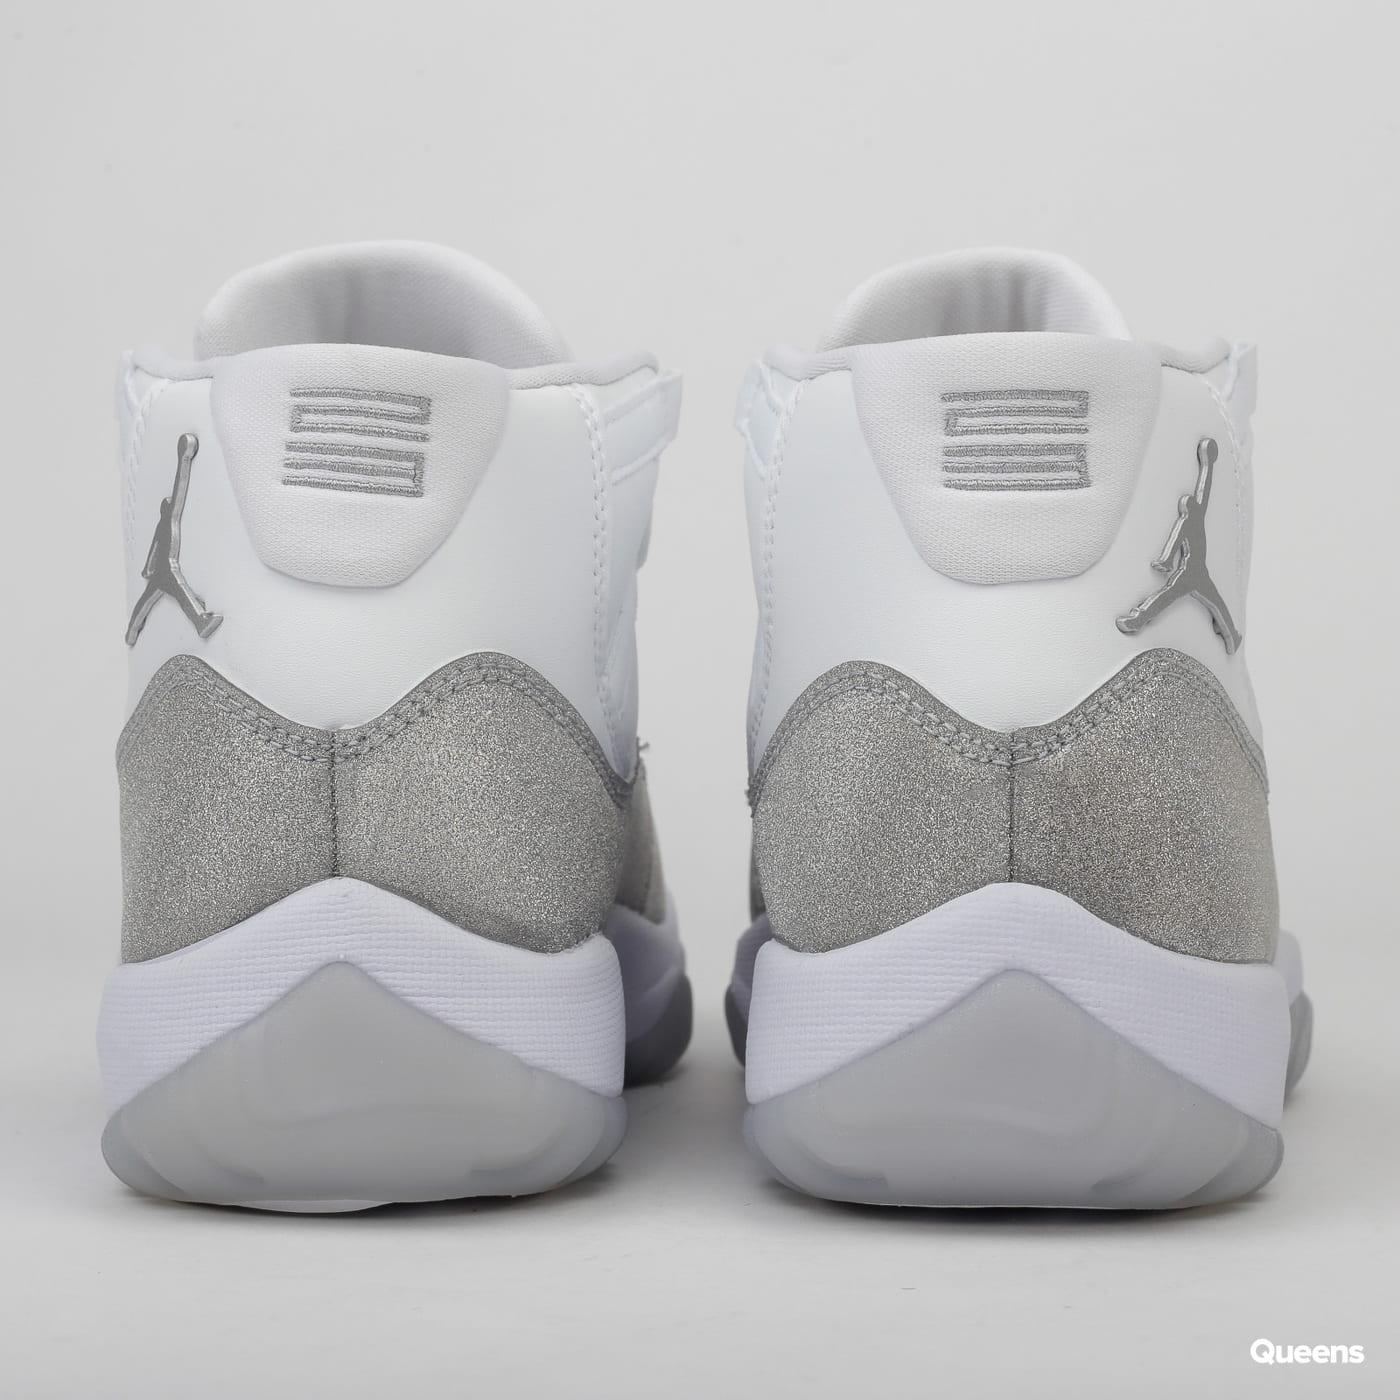 Jordan WMNS Air Jordan 11 Retro white / metallic silver